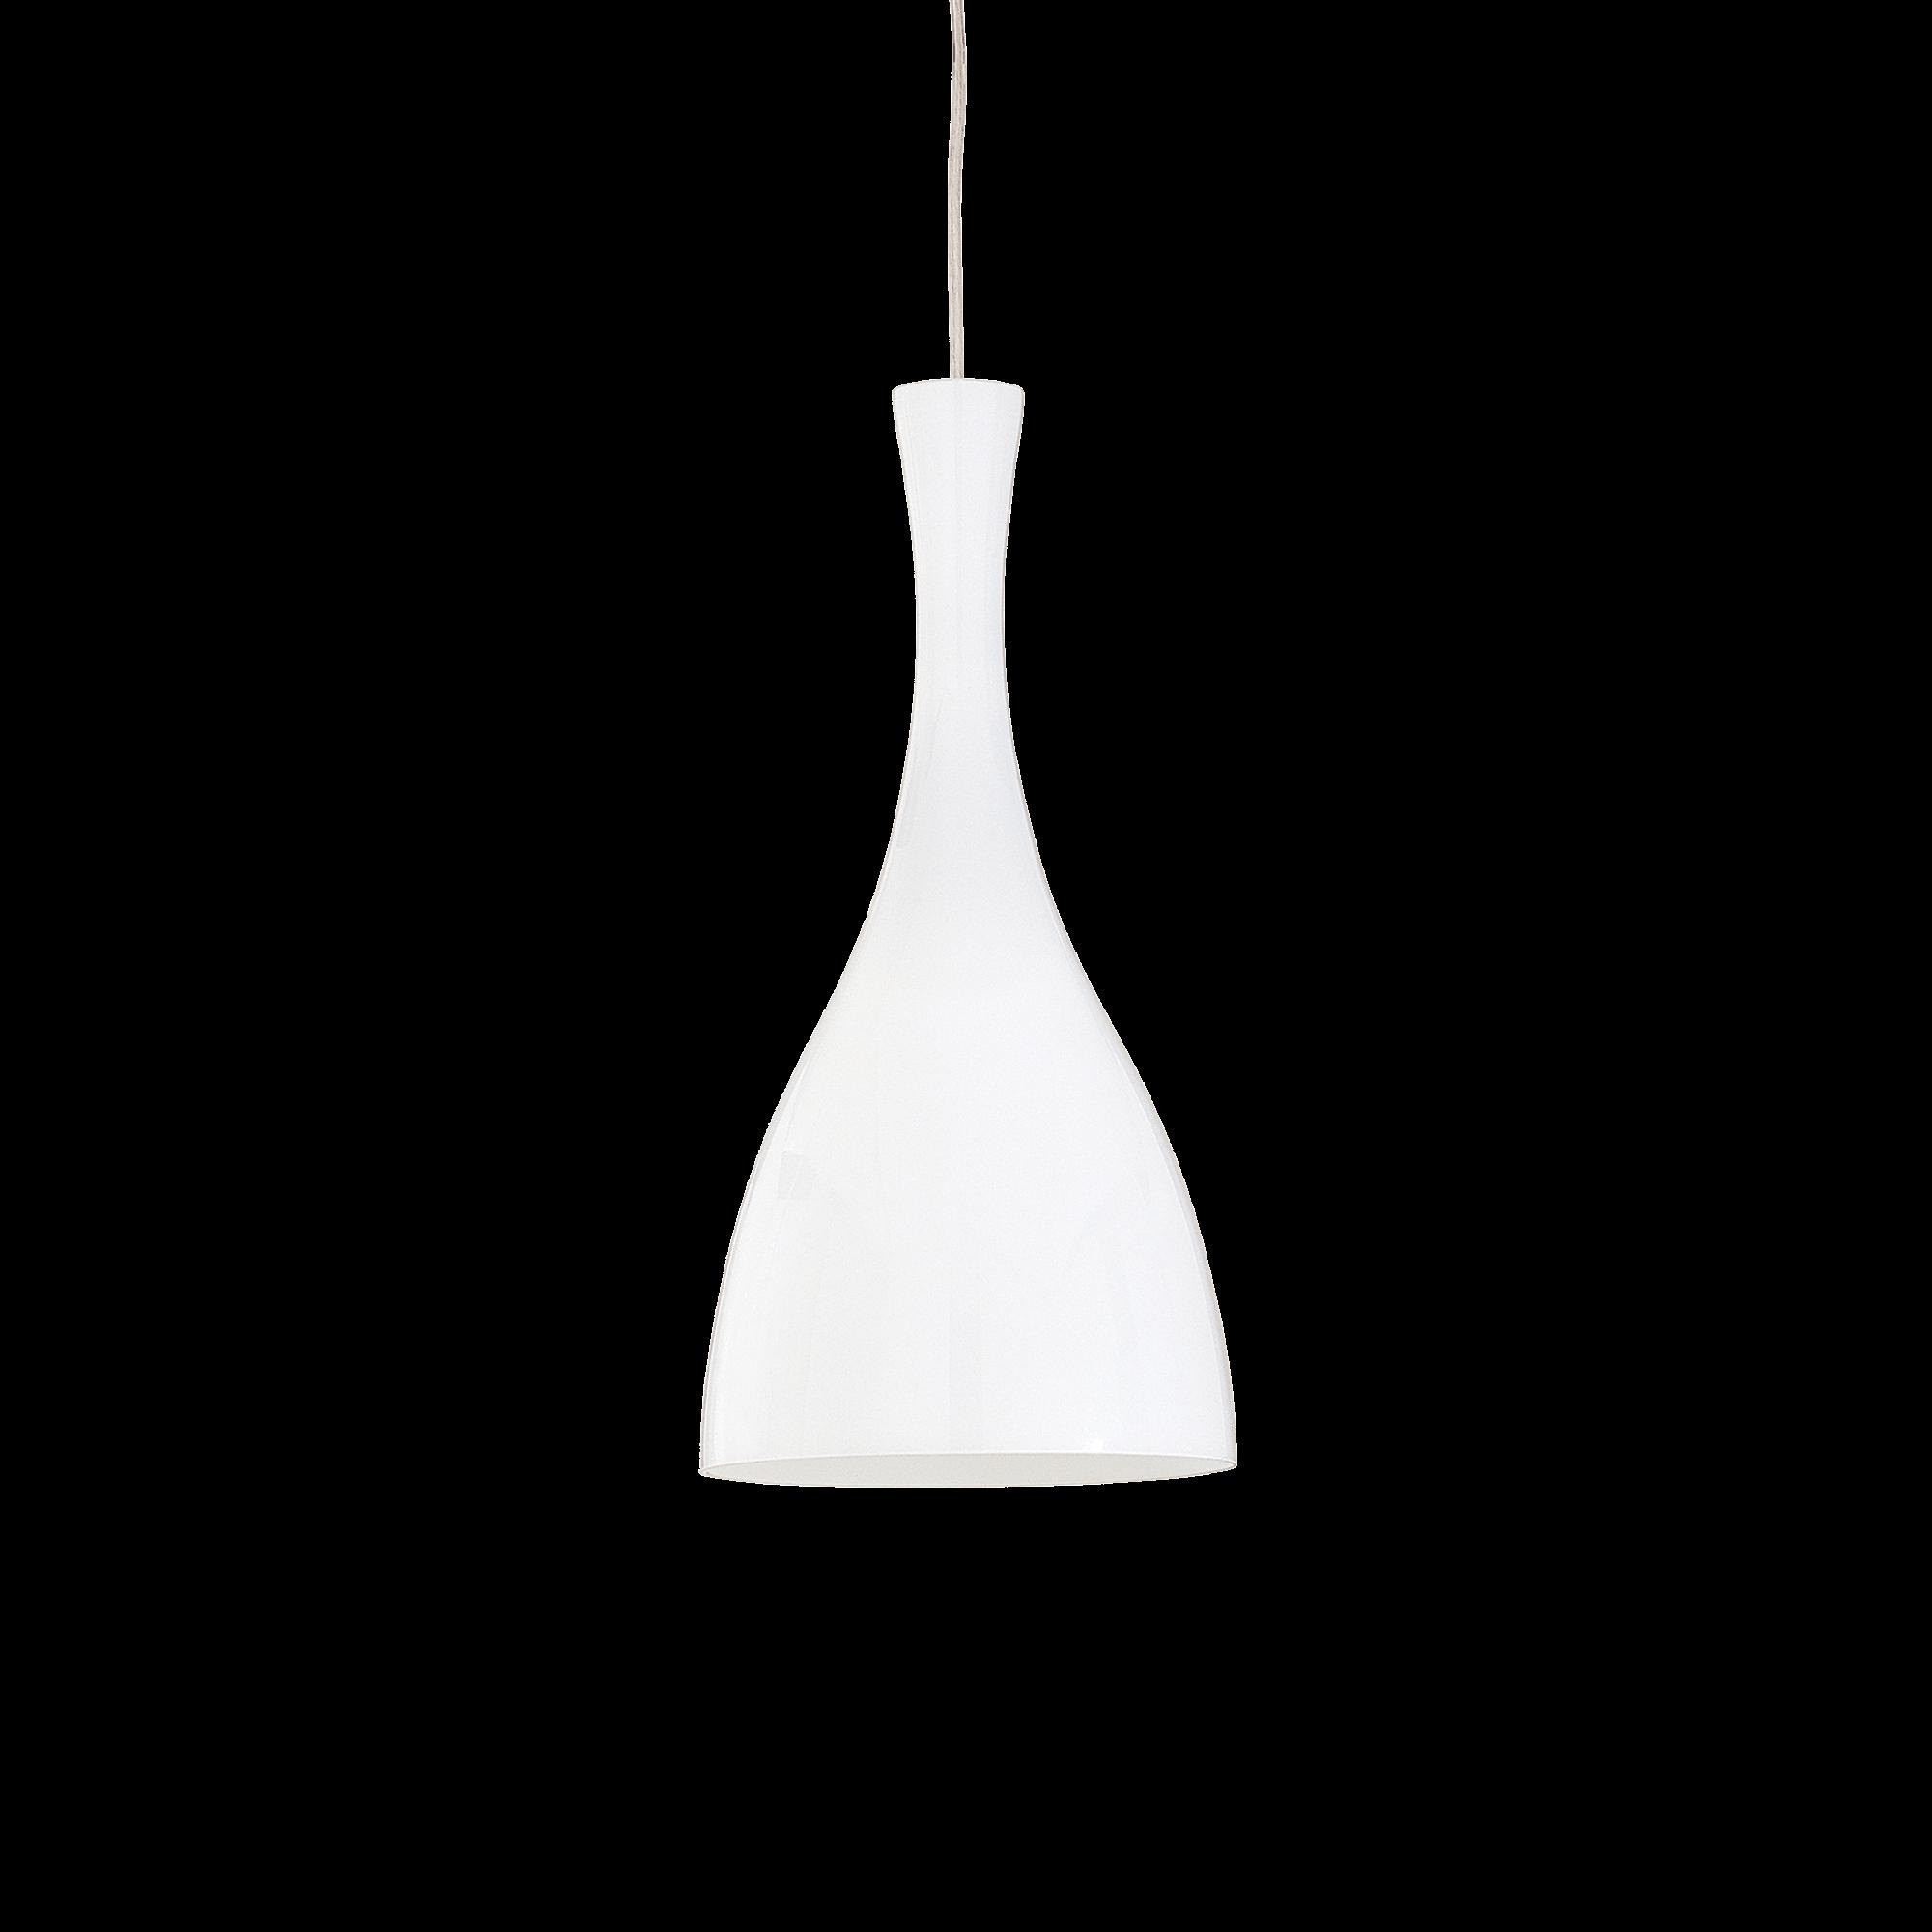 Ideal Lux 013244 Olimpia SP1 Bianco lámpa függeszték